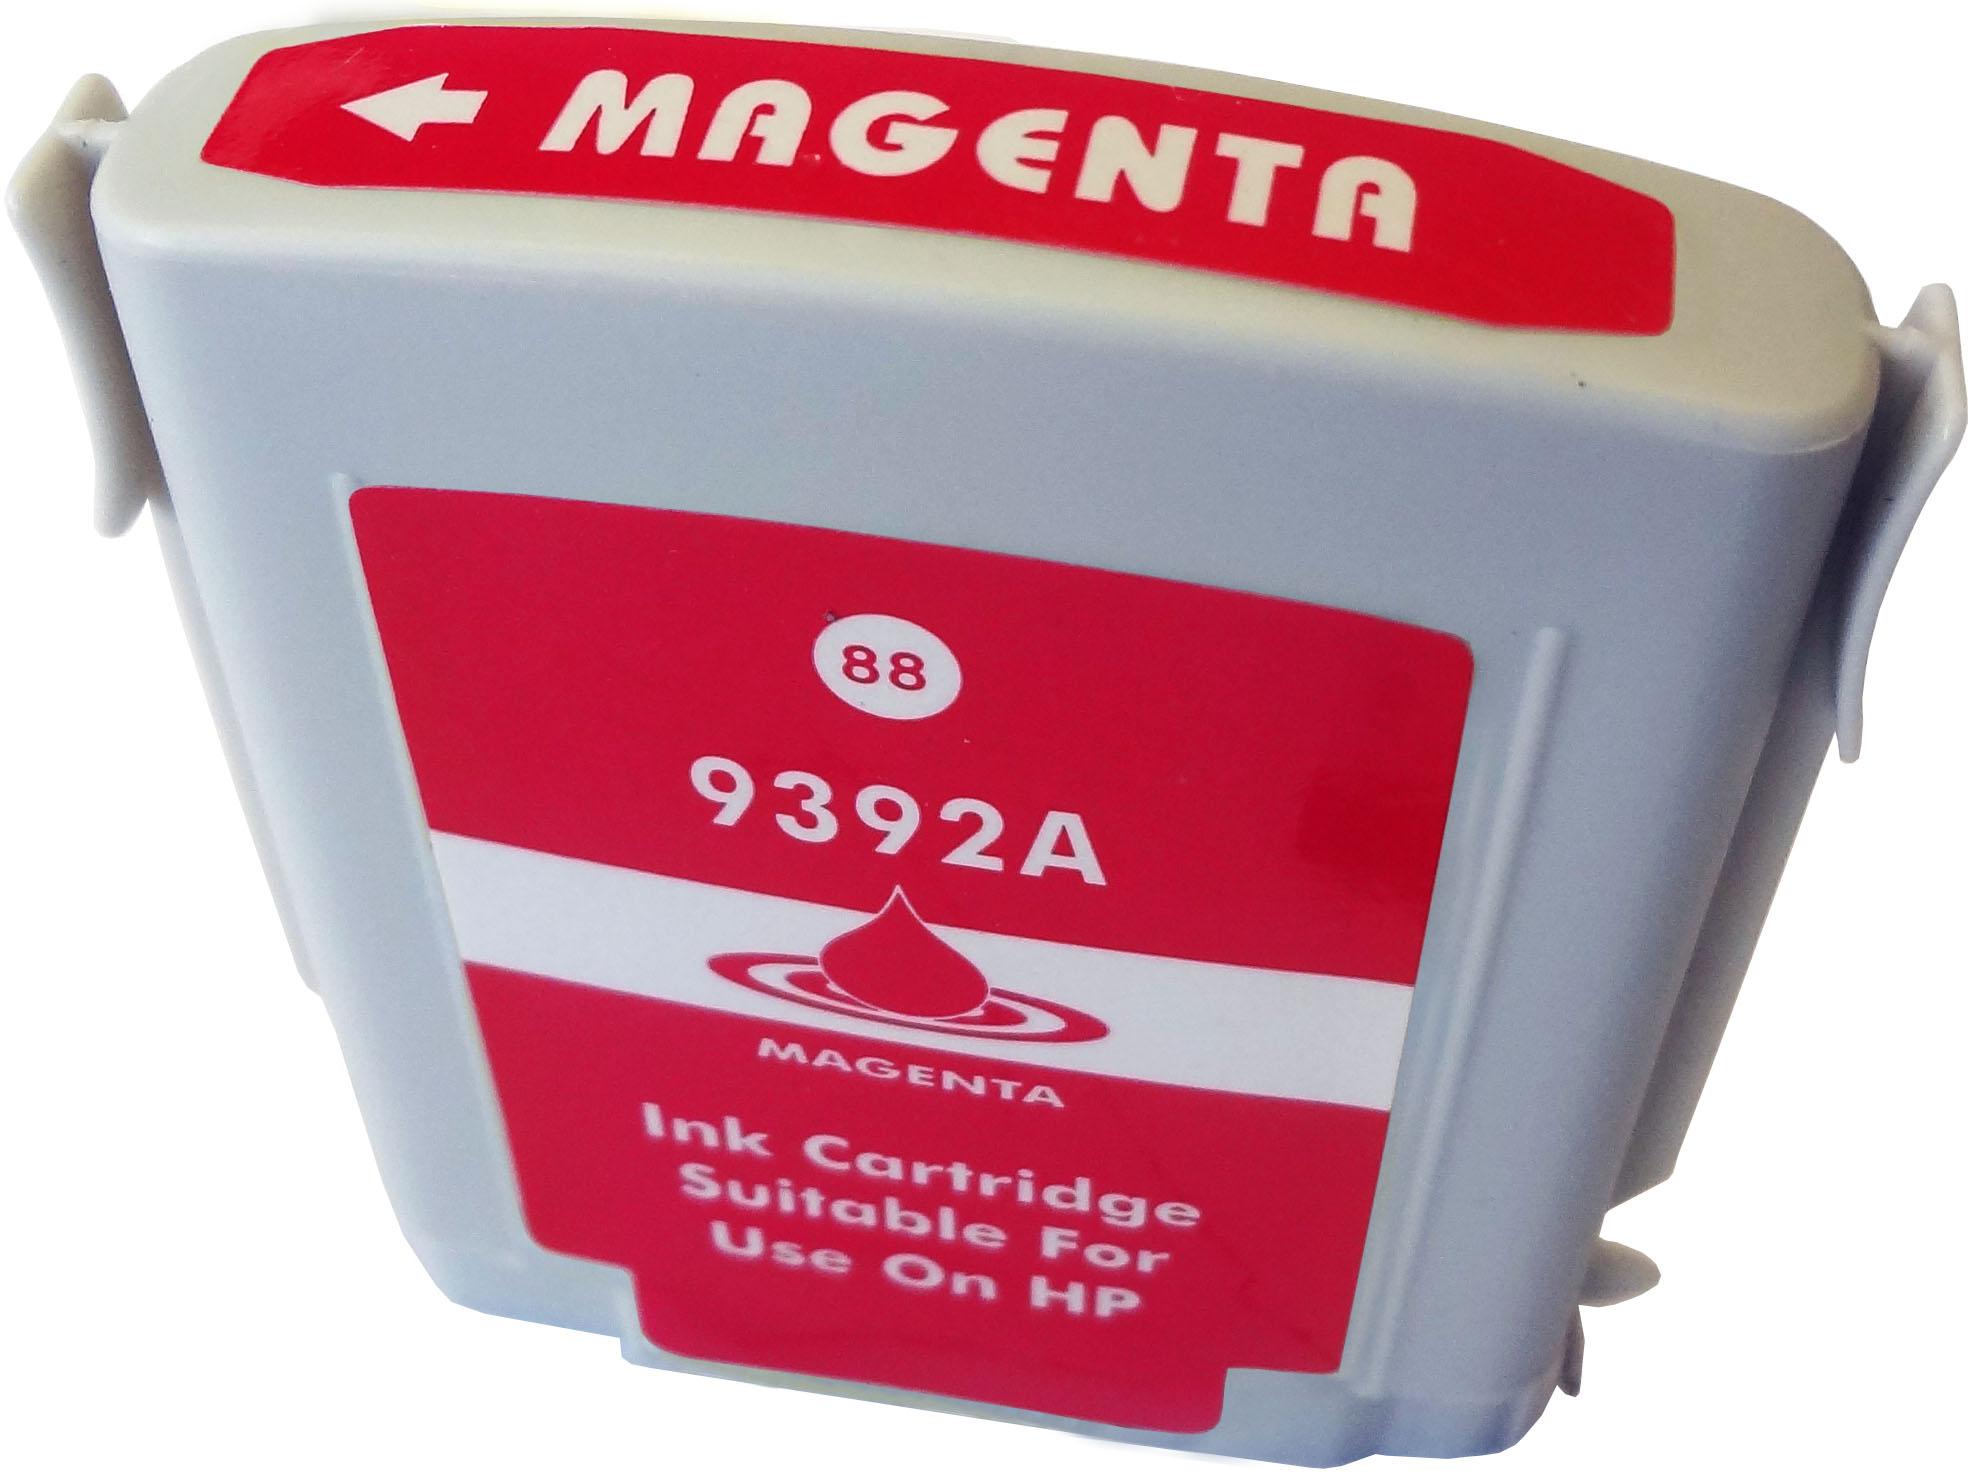 HP 88 XL magenta